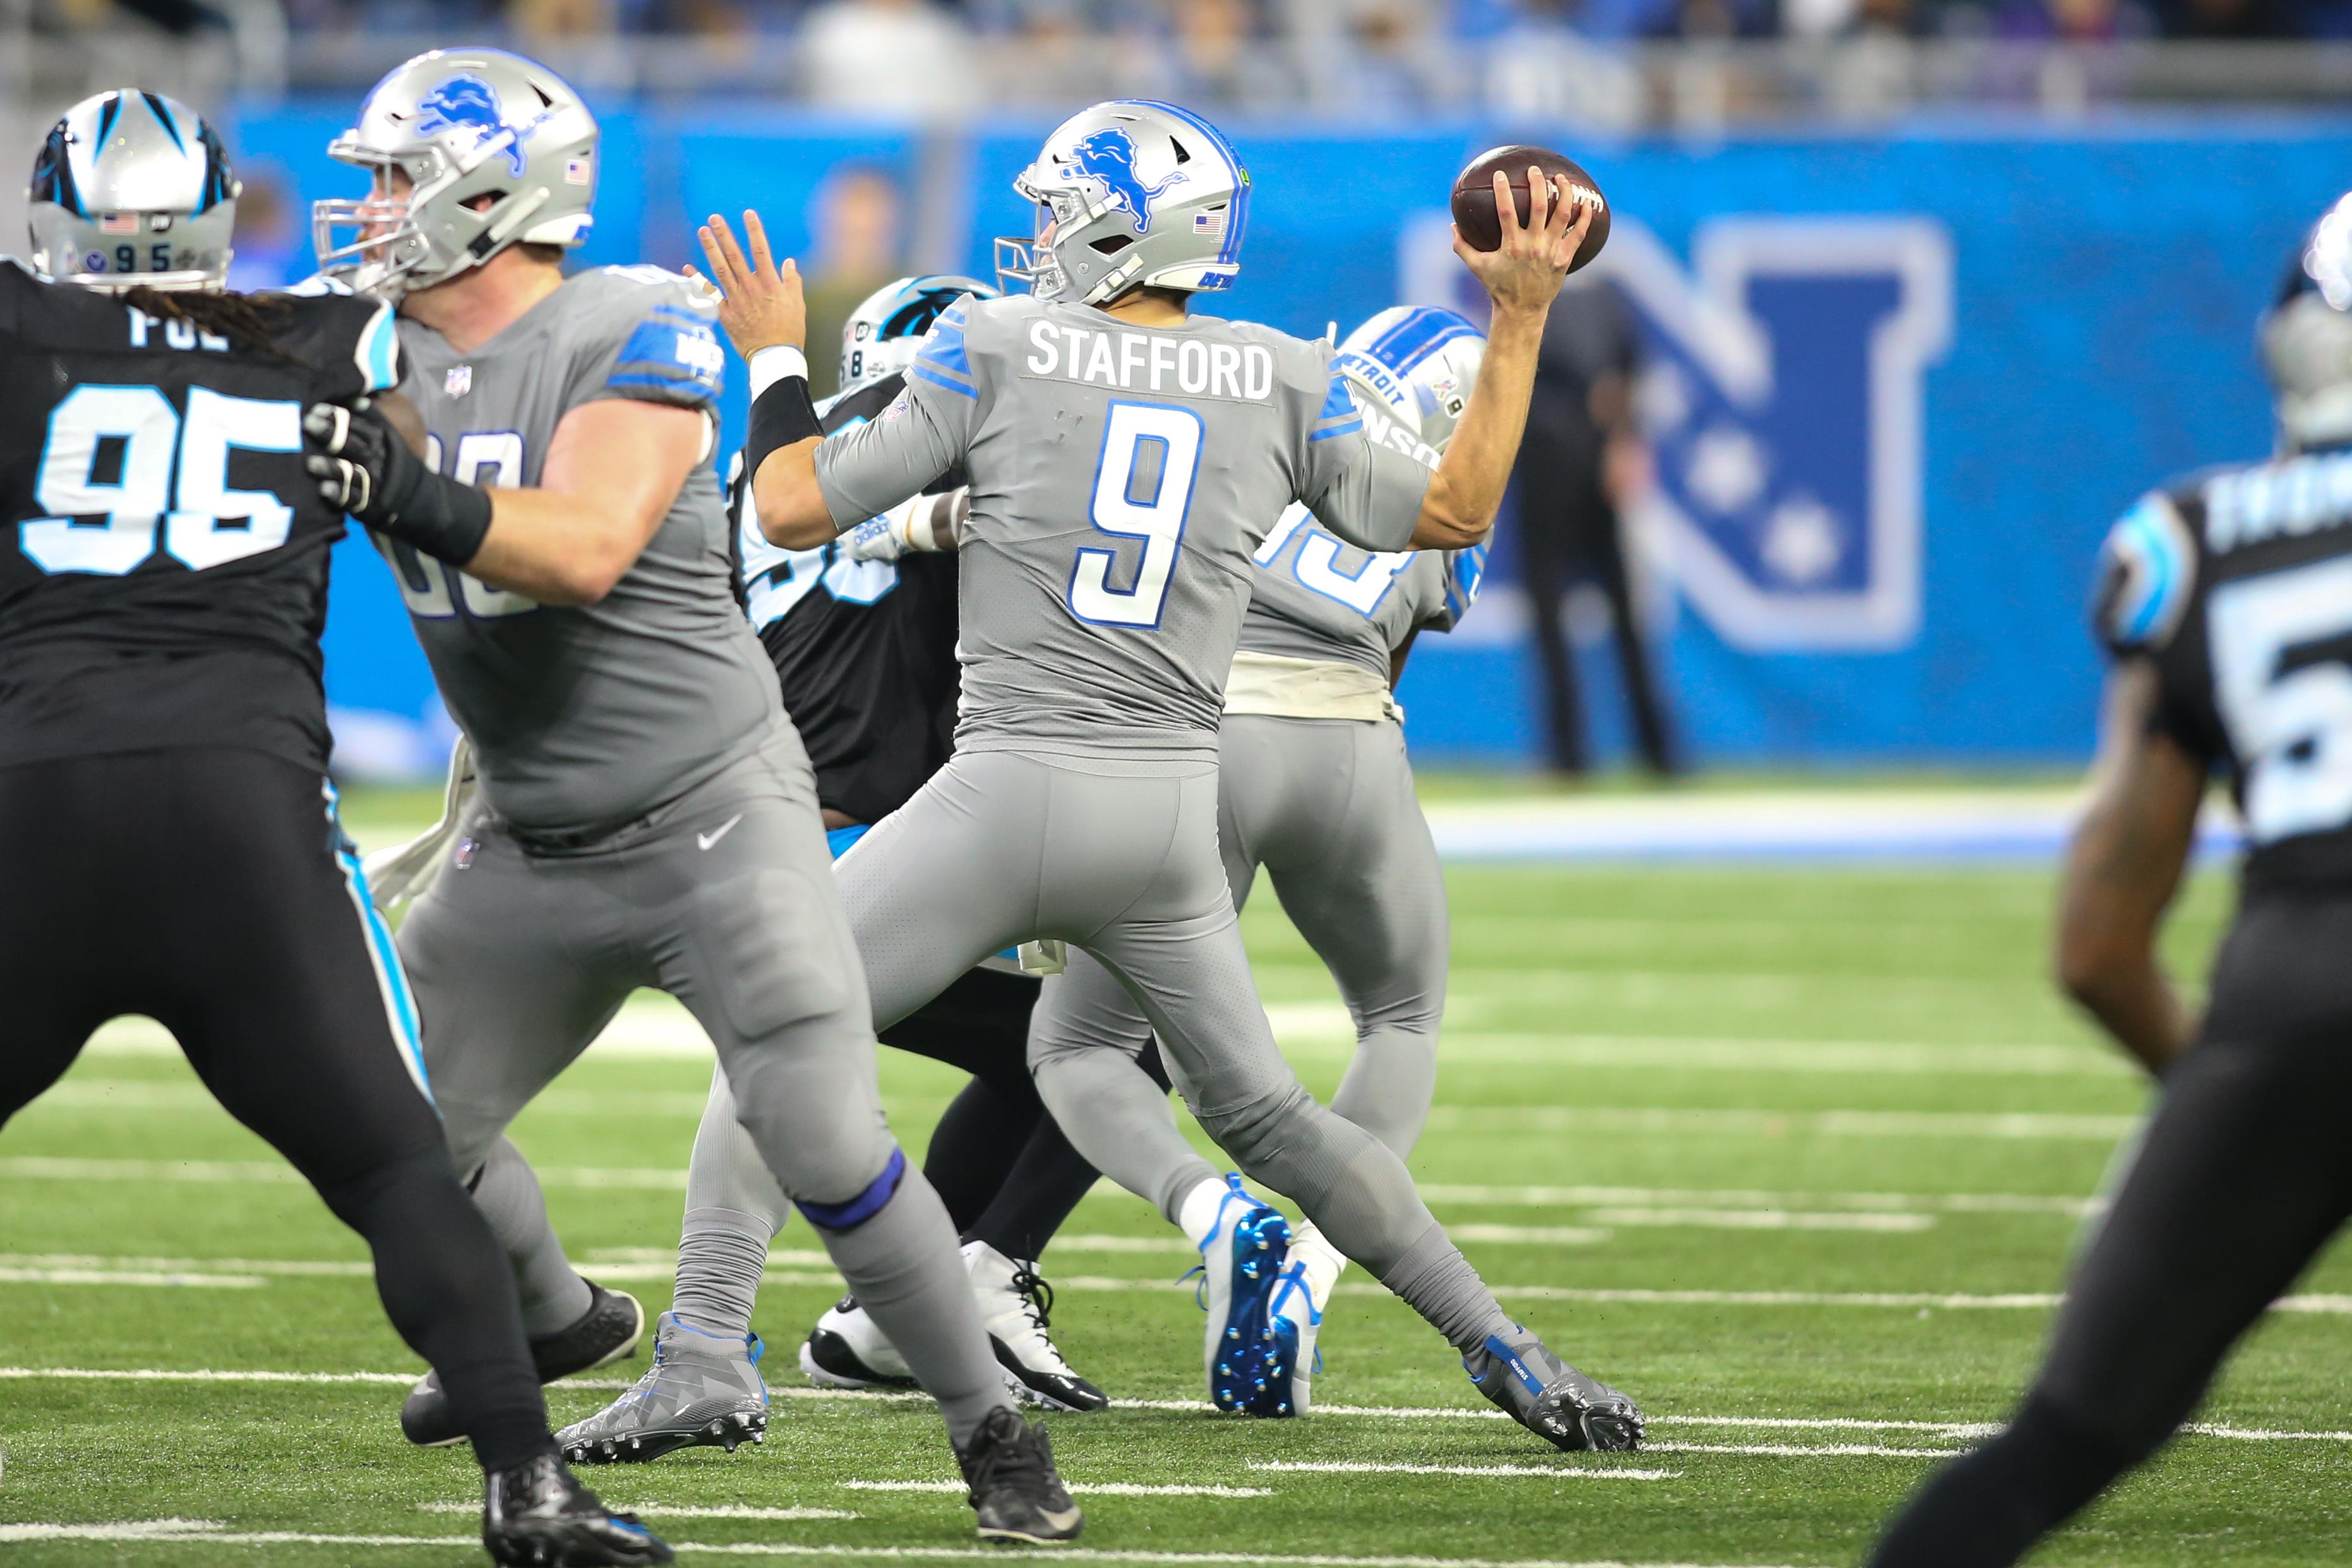 NFL: NOV 18 Panthers at Lions